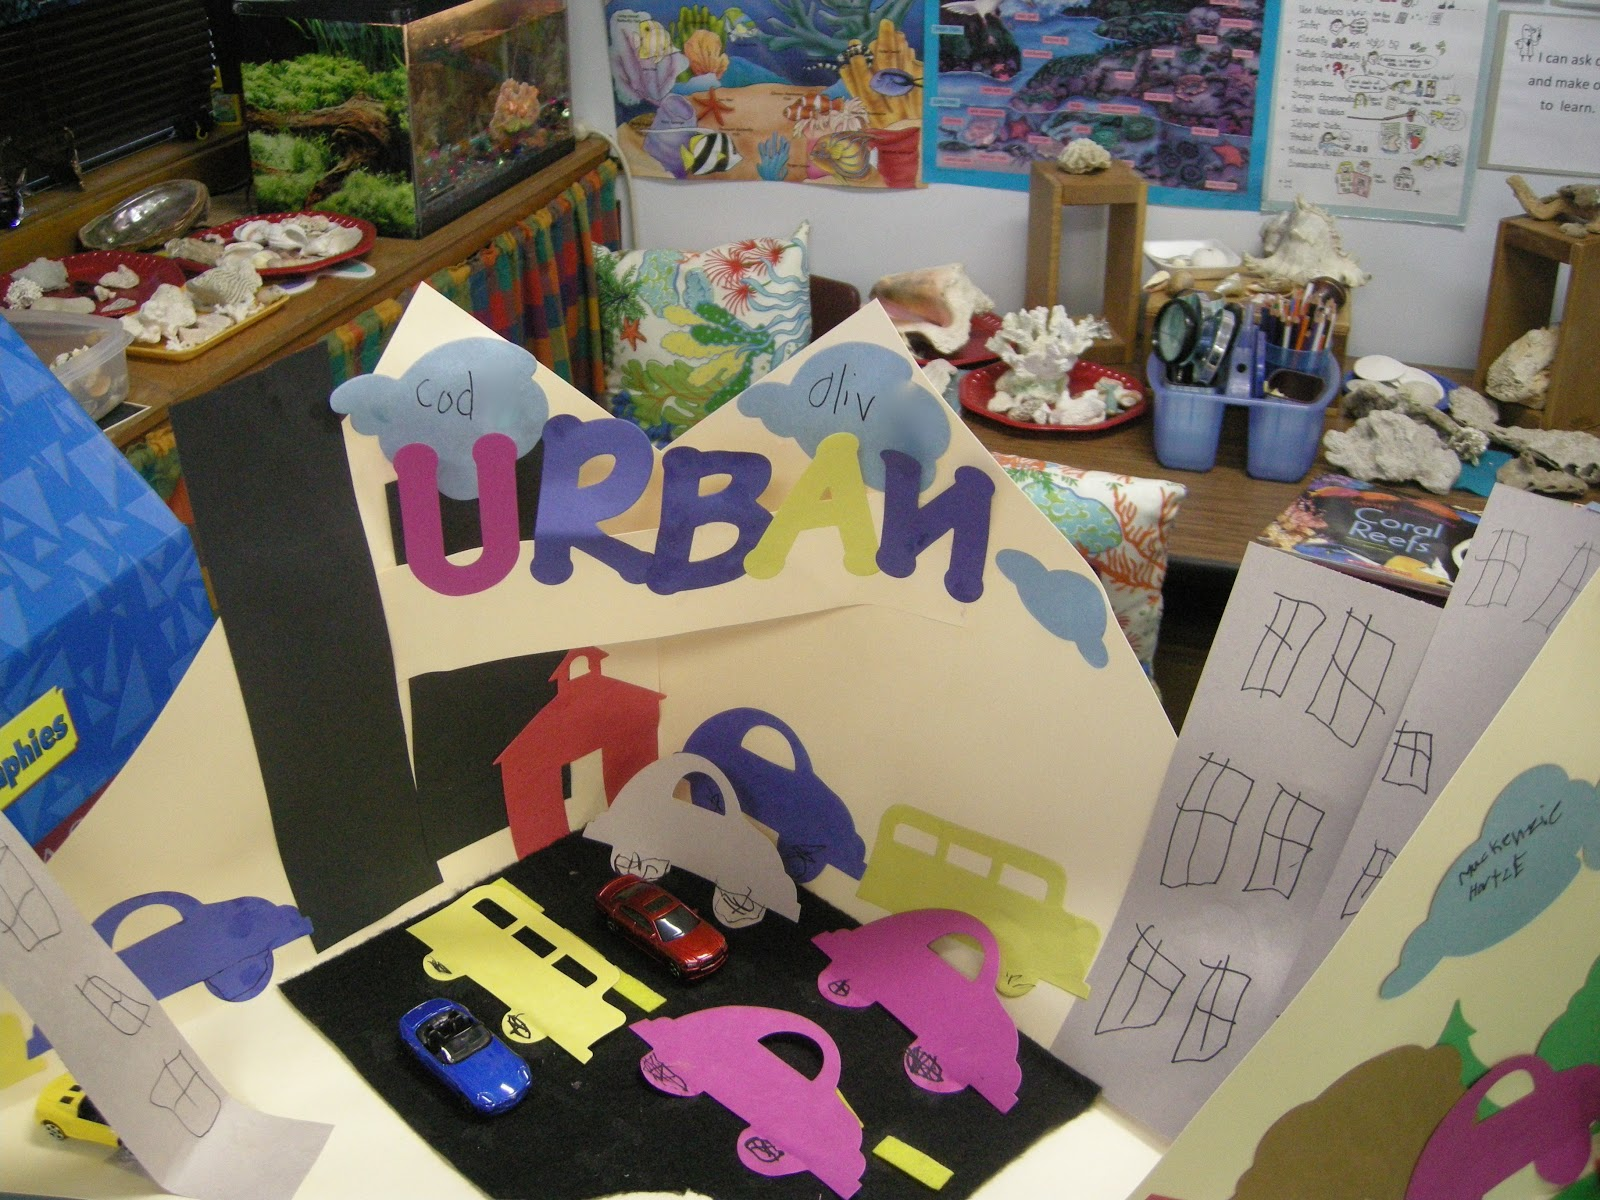 diorama of urban communities